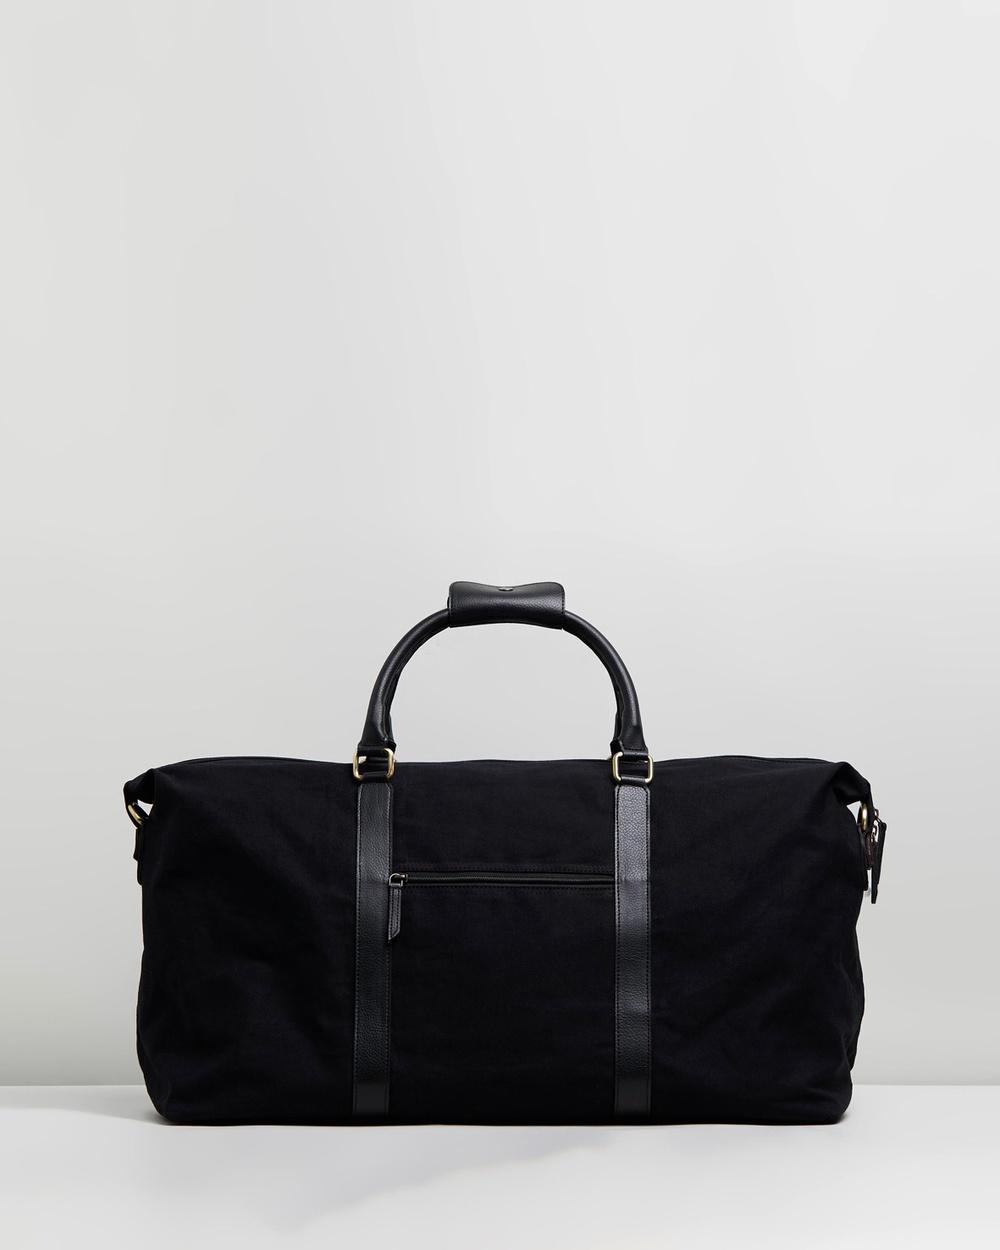 Staple Superior Downtown Weekender Duffle Bags All Black